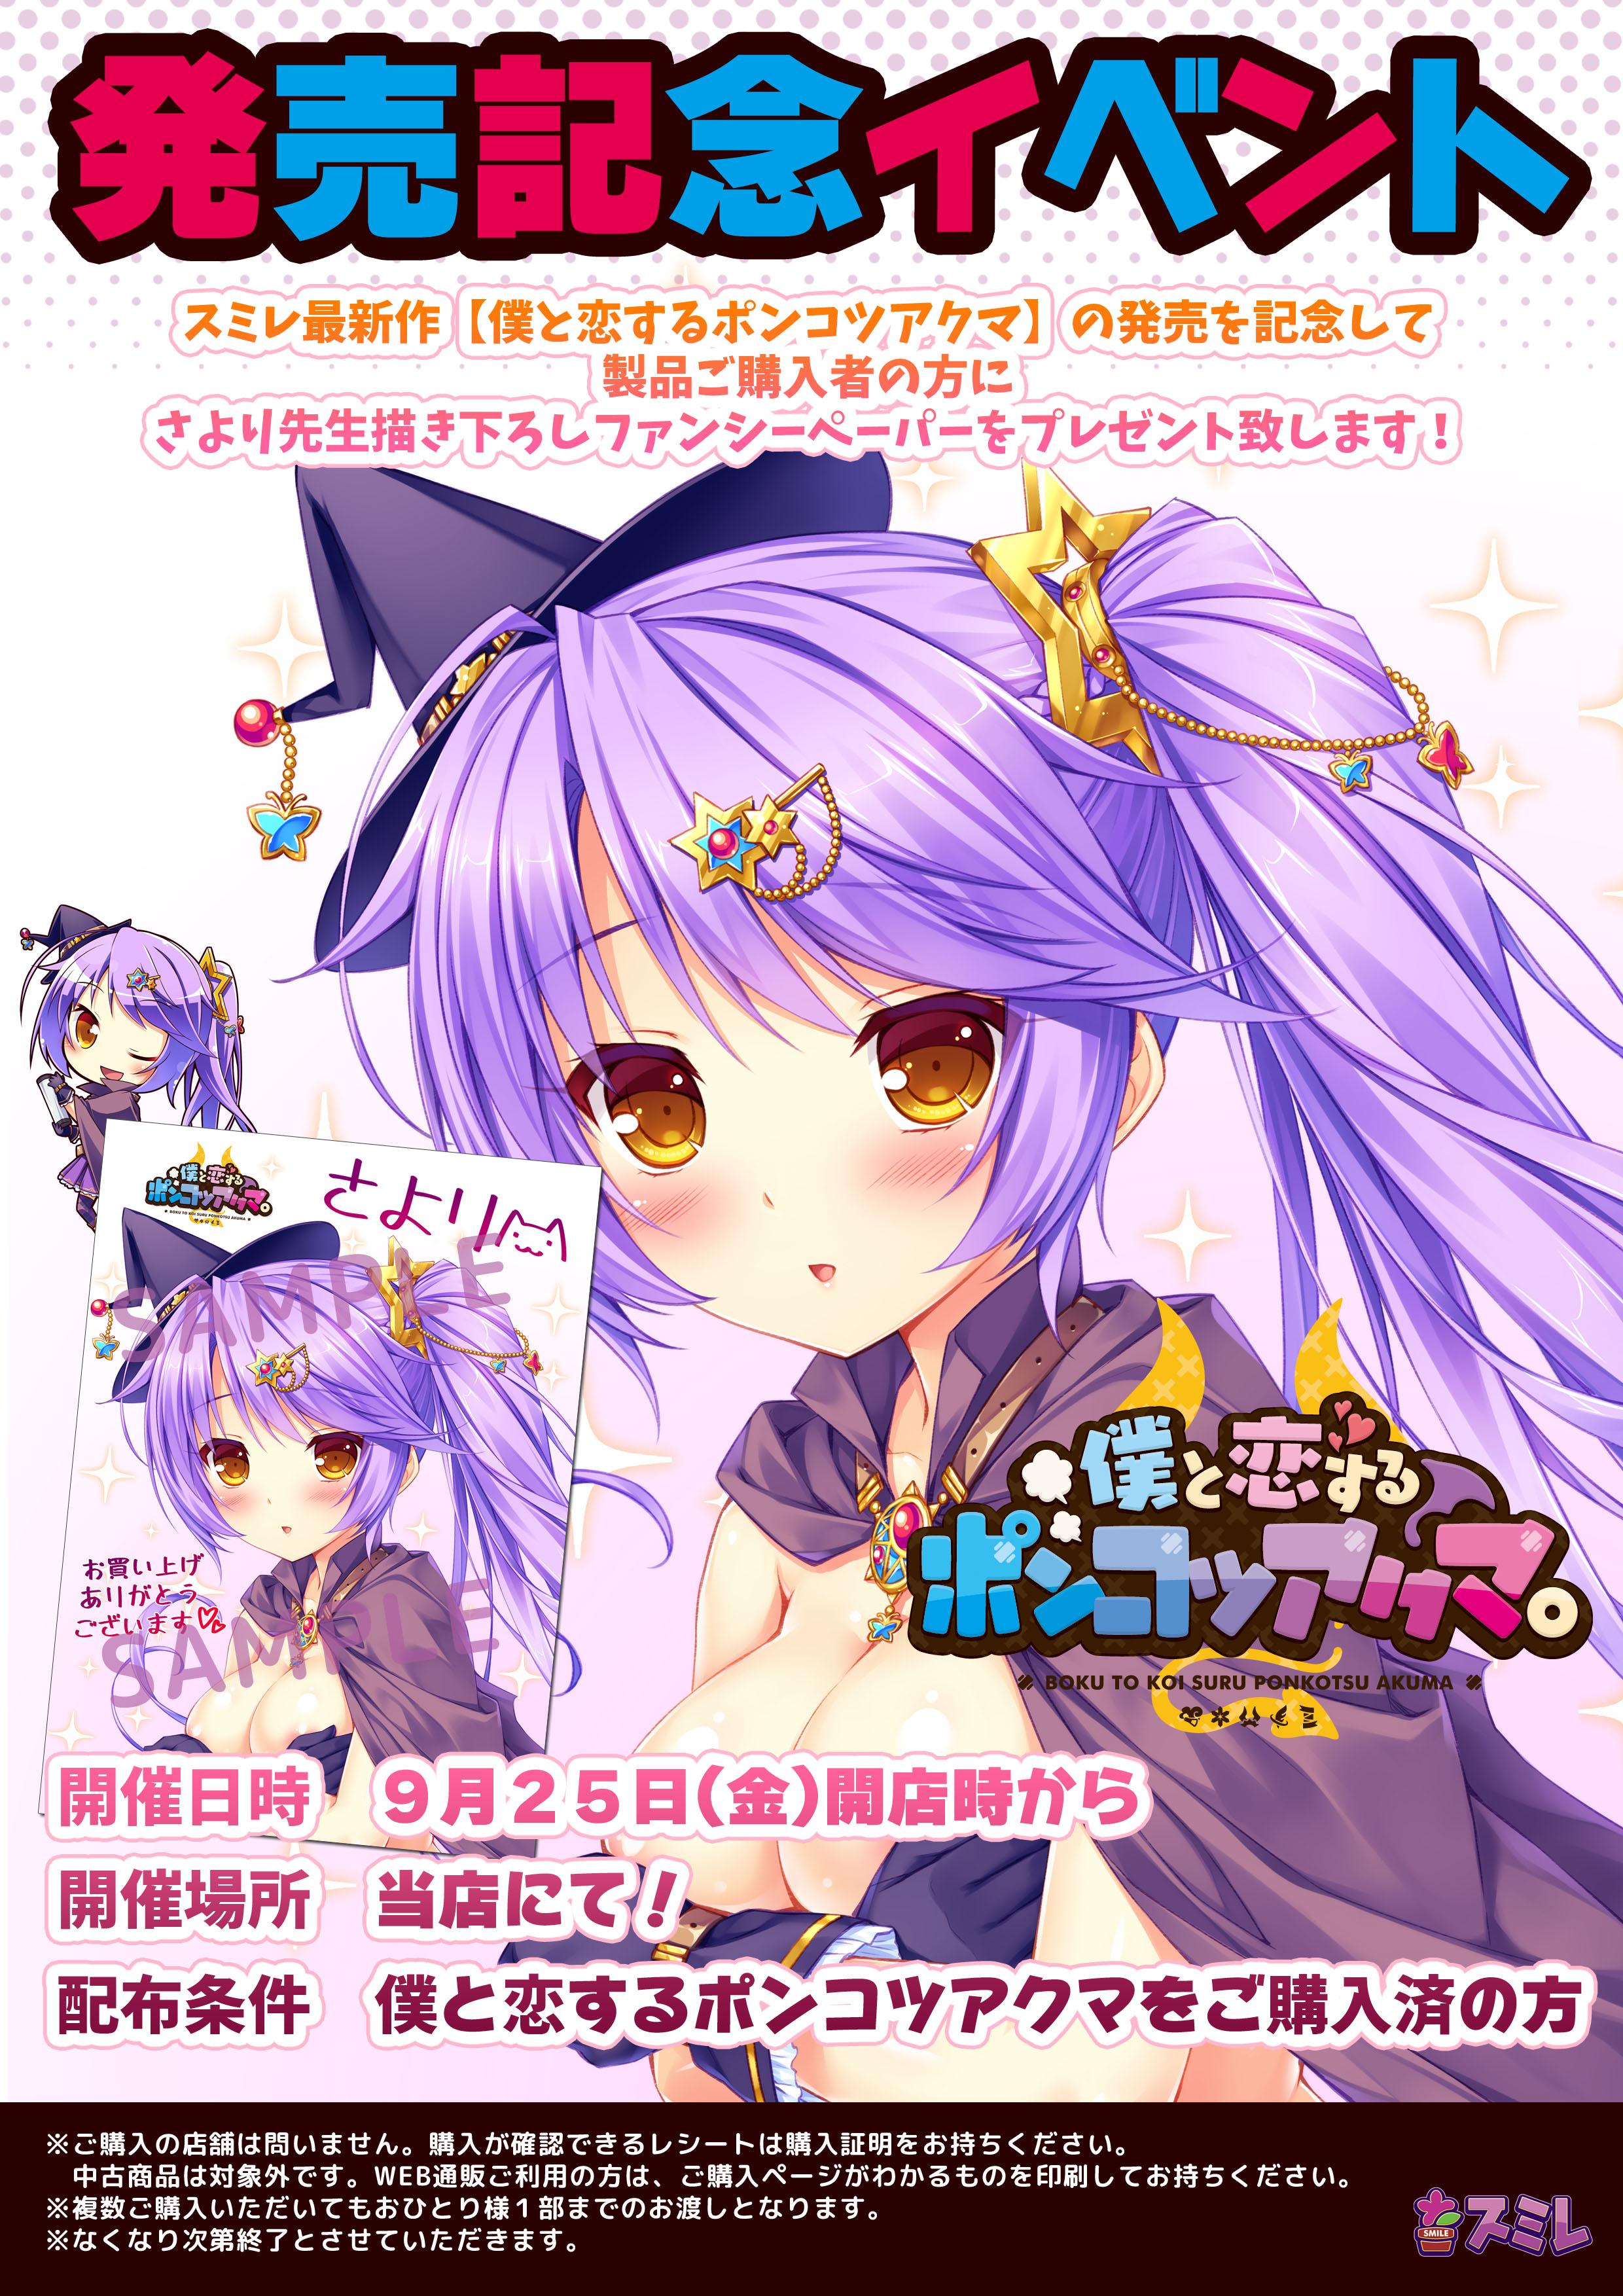 koikuma_pop_0925.jpg